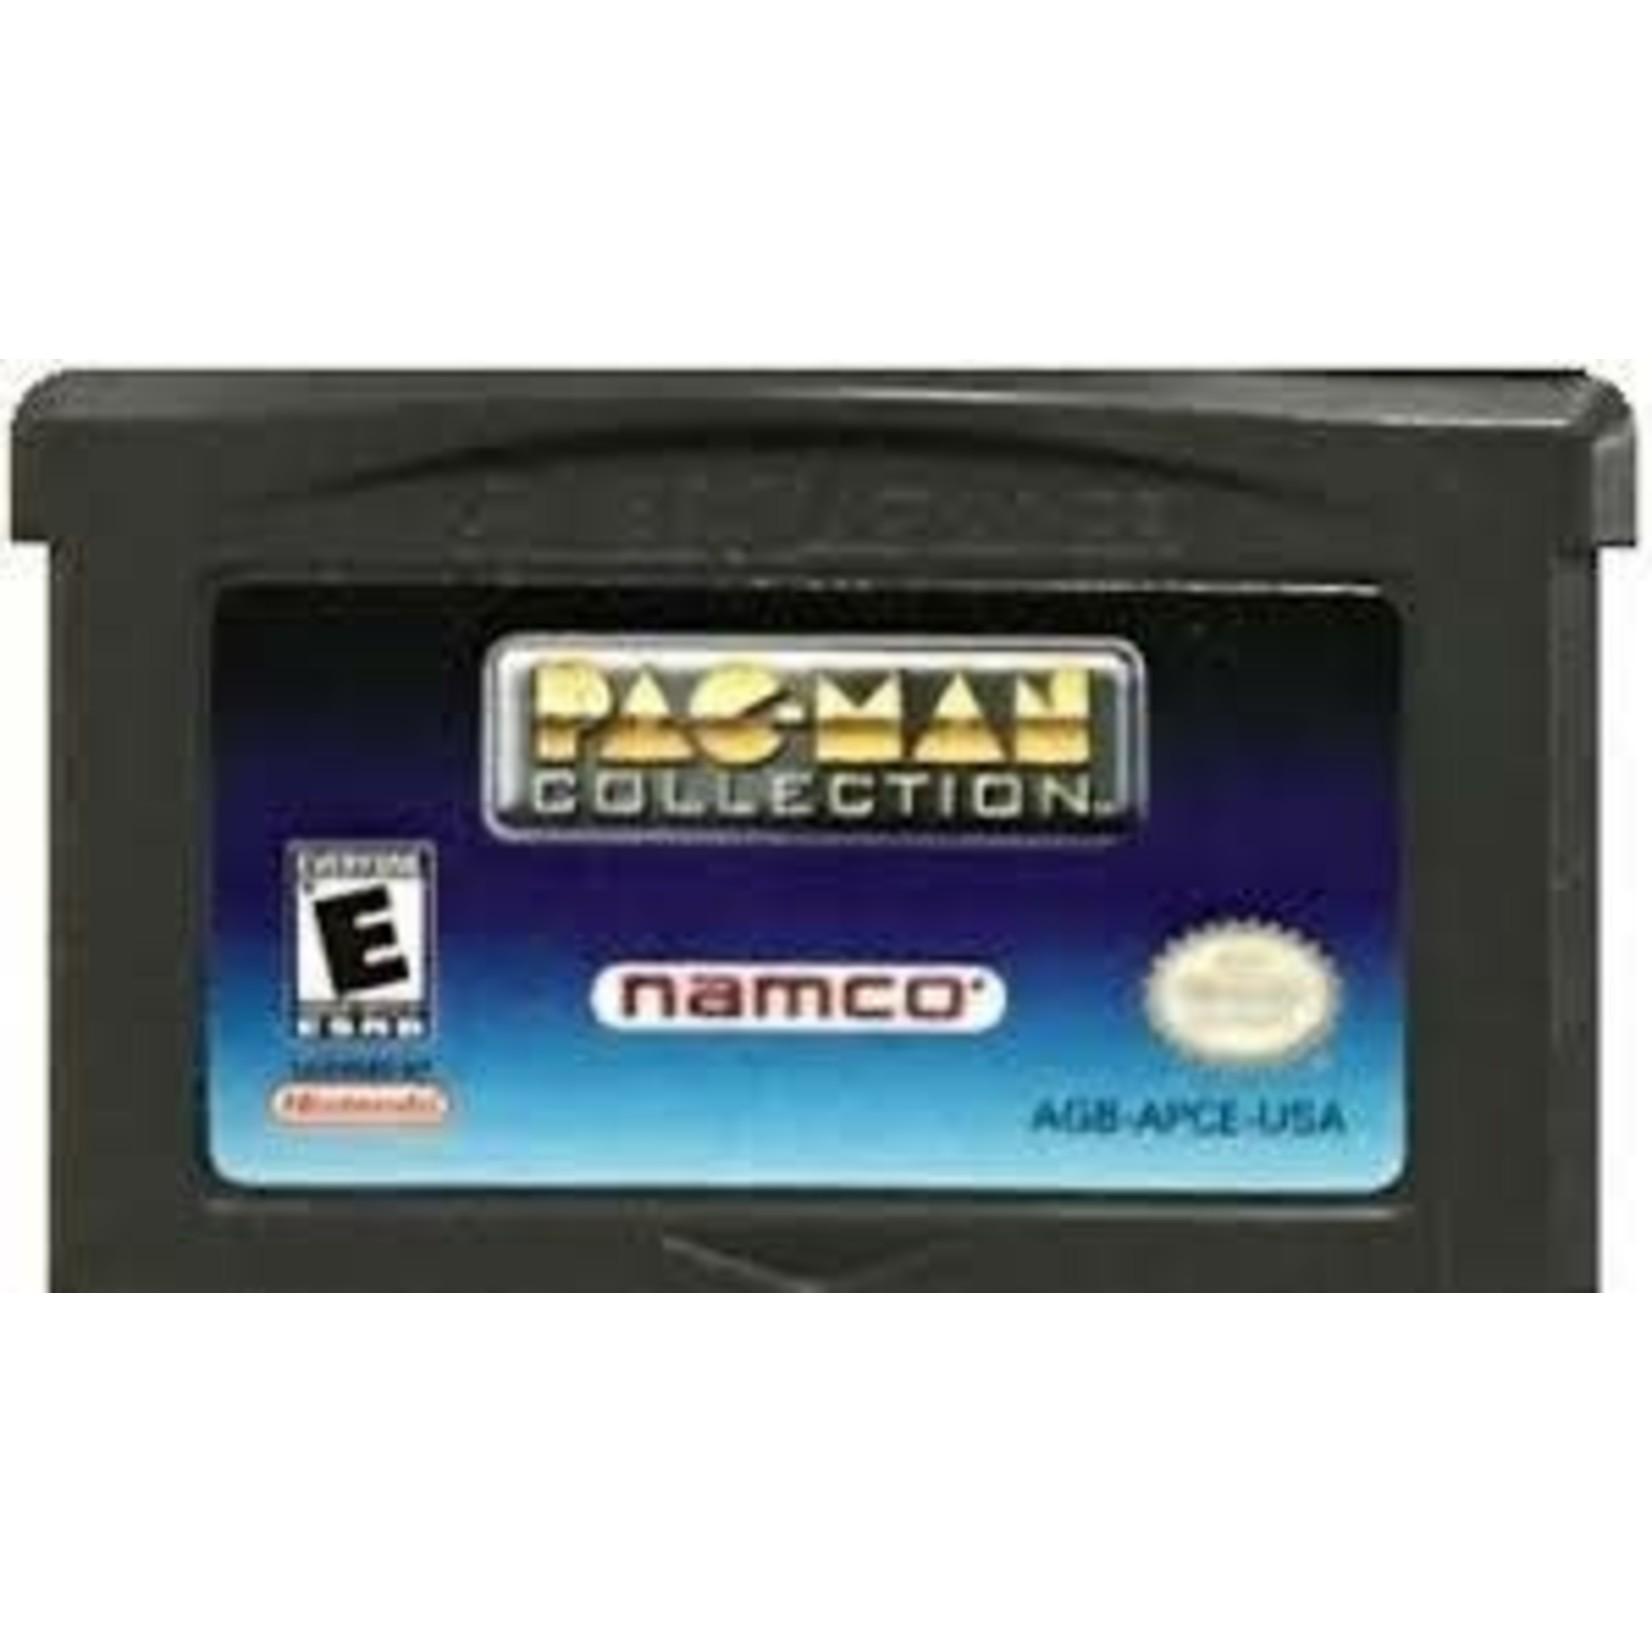 GBAU-Pac-Man Collection